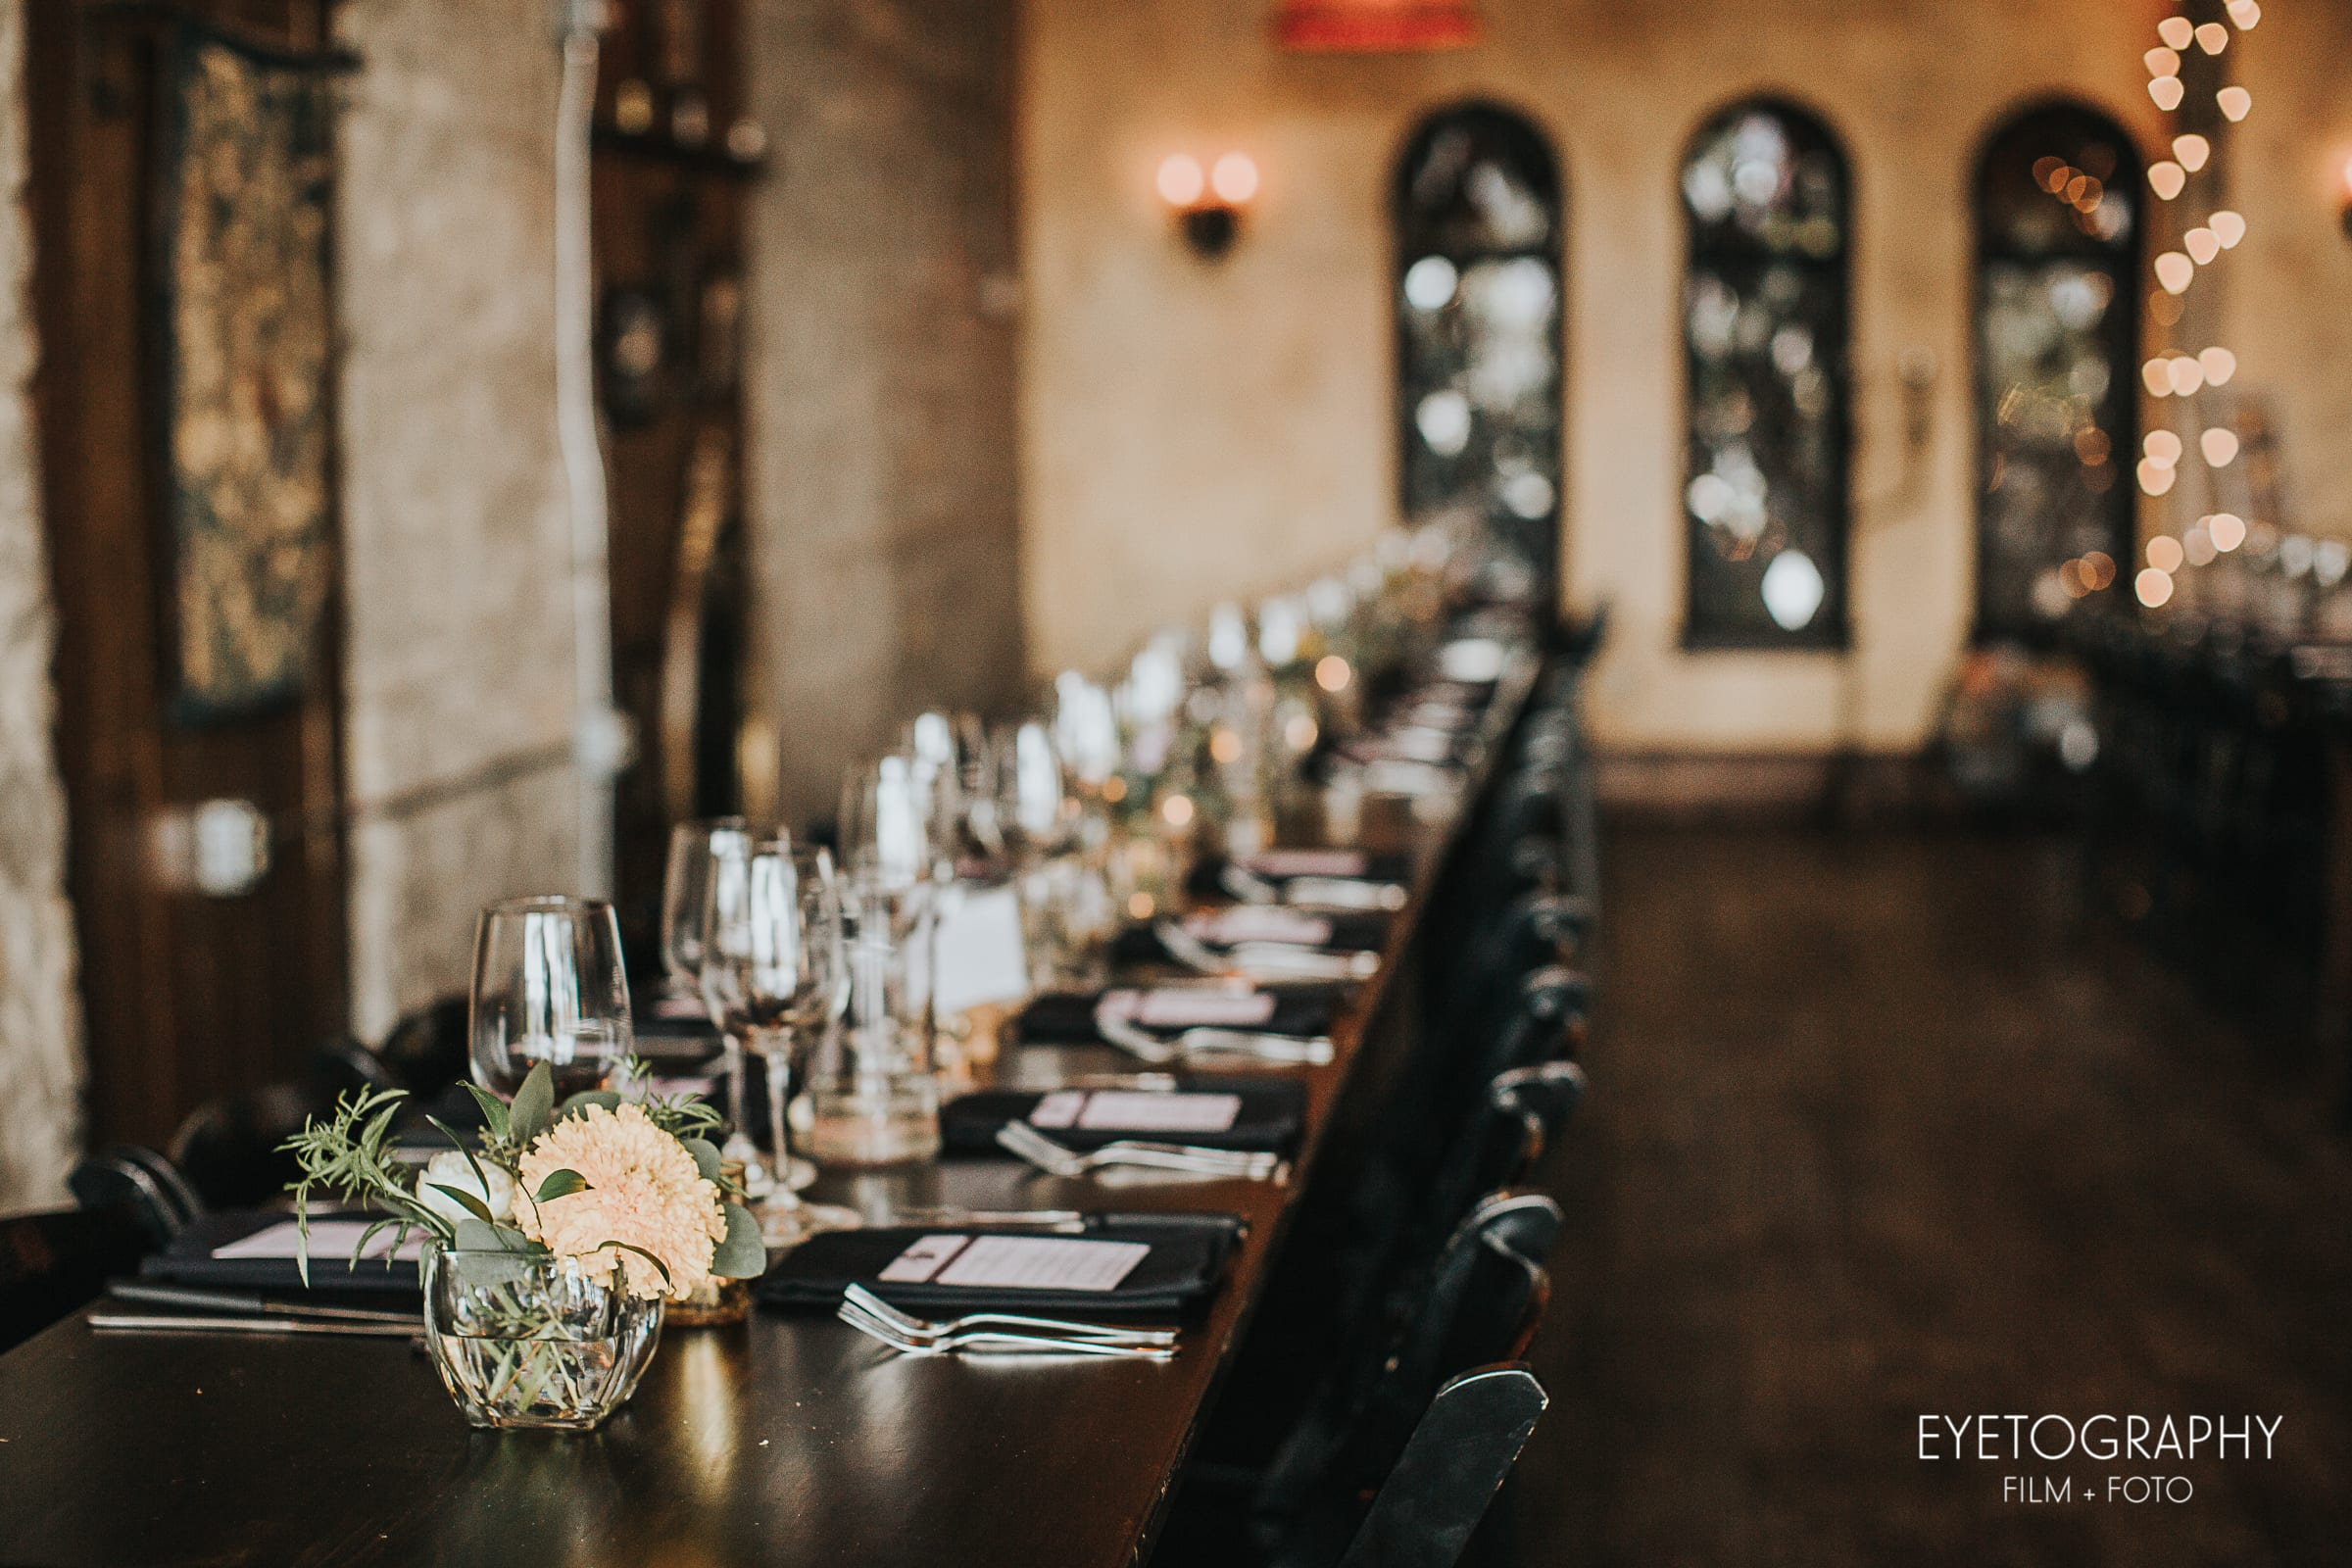 Aster Cafe, Eyetography, purple wedding, summer wedding, outdoor wedding, Artemisia Studios, sunflower bouquet, sunflower wedding, Minnesota wedding florist, Minneapolis wedding florist